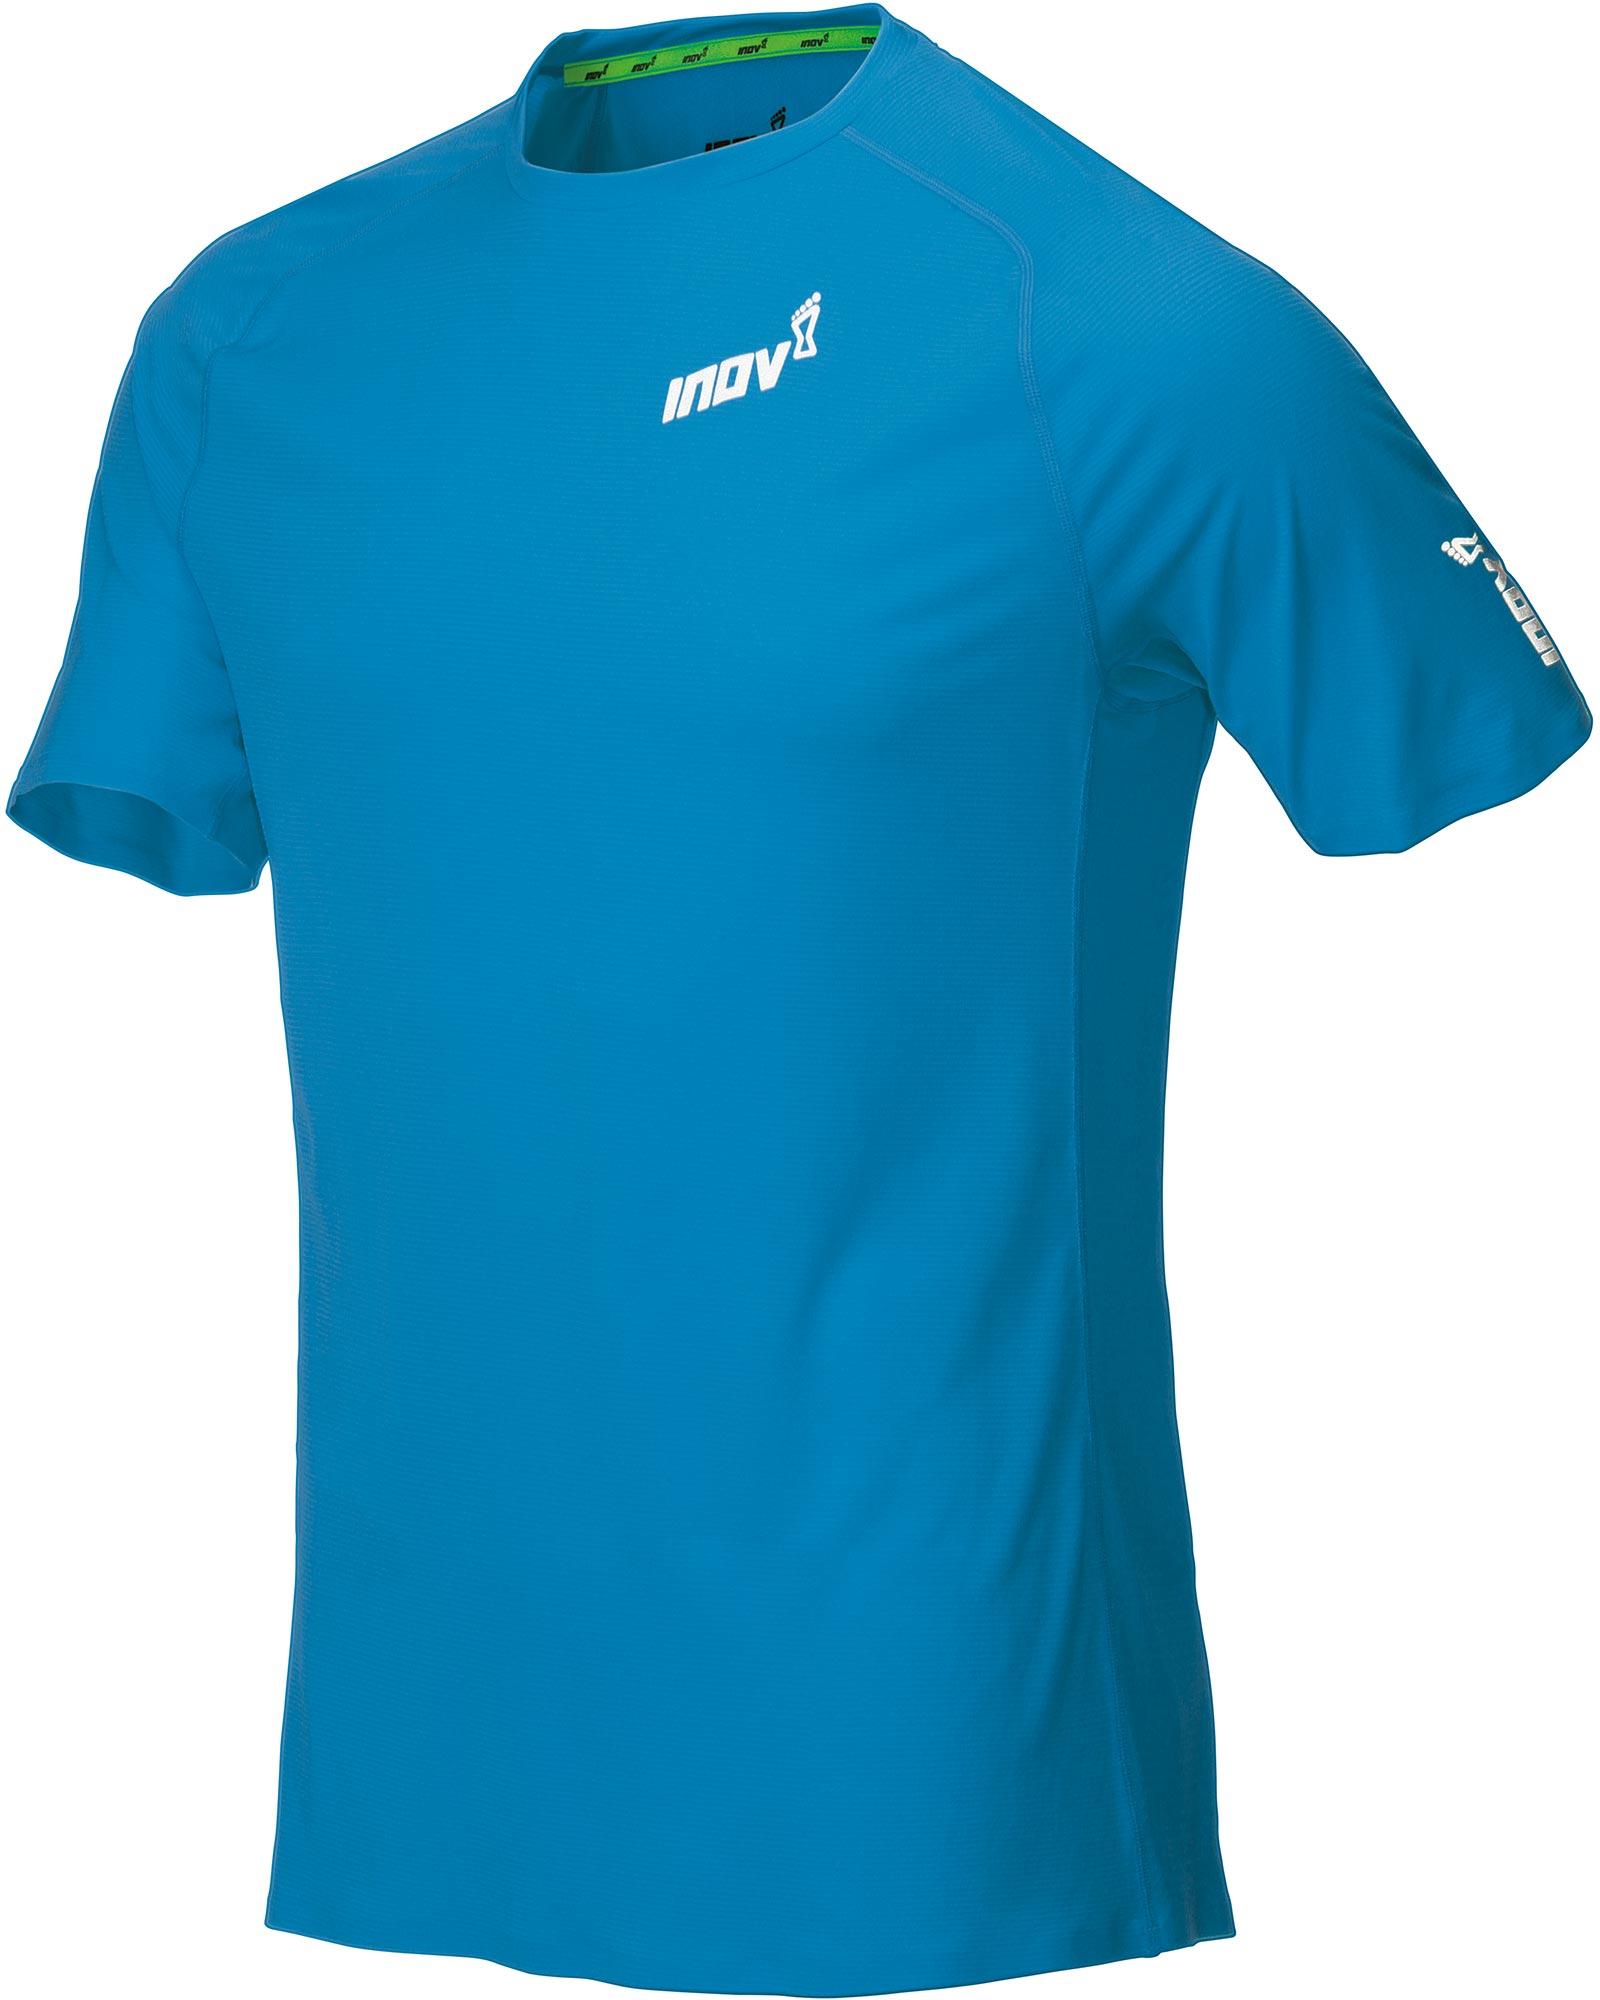 Inov-8 S/S Base Elite Men's T-Shirt 0